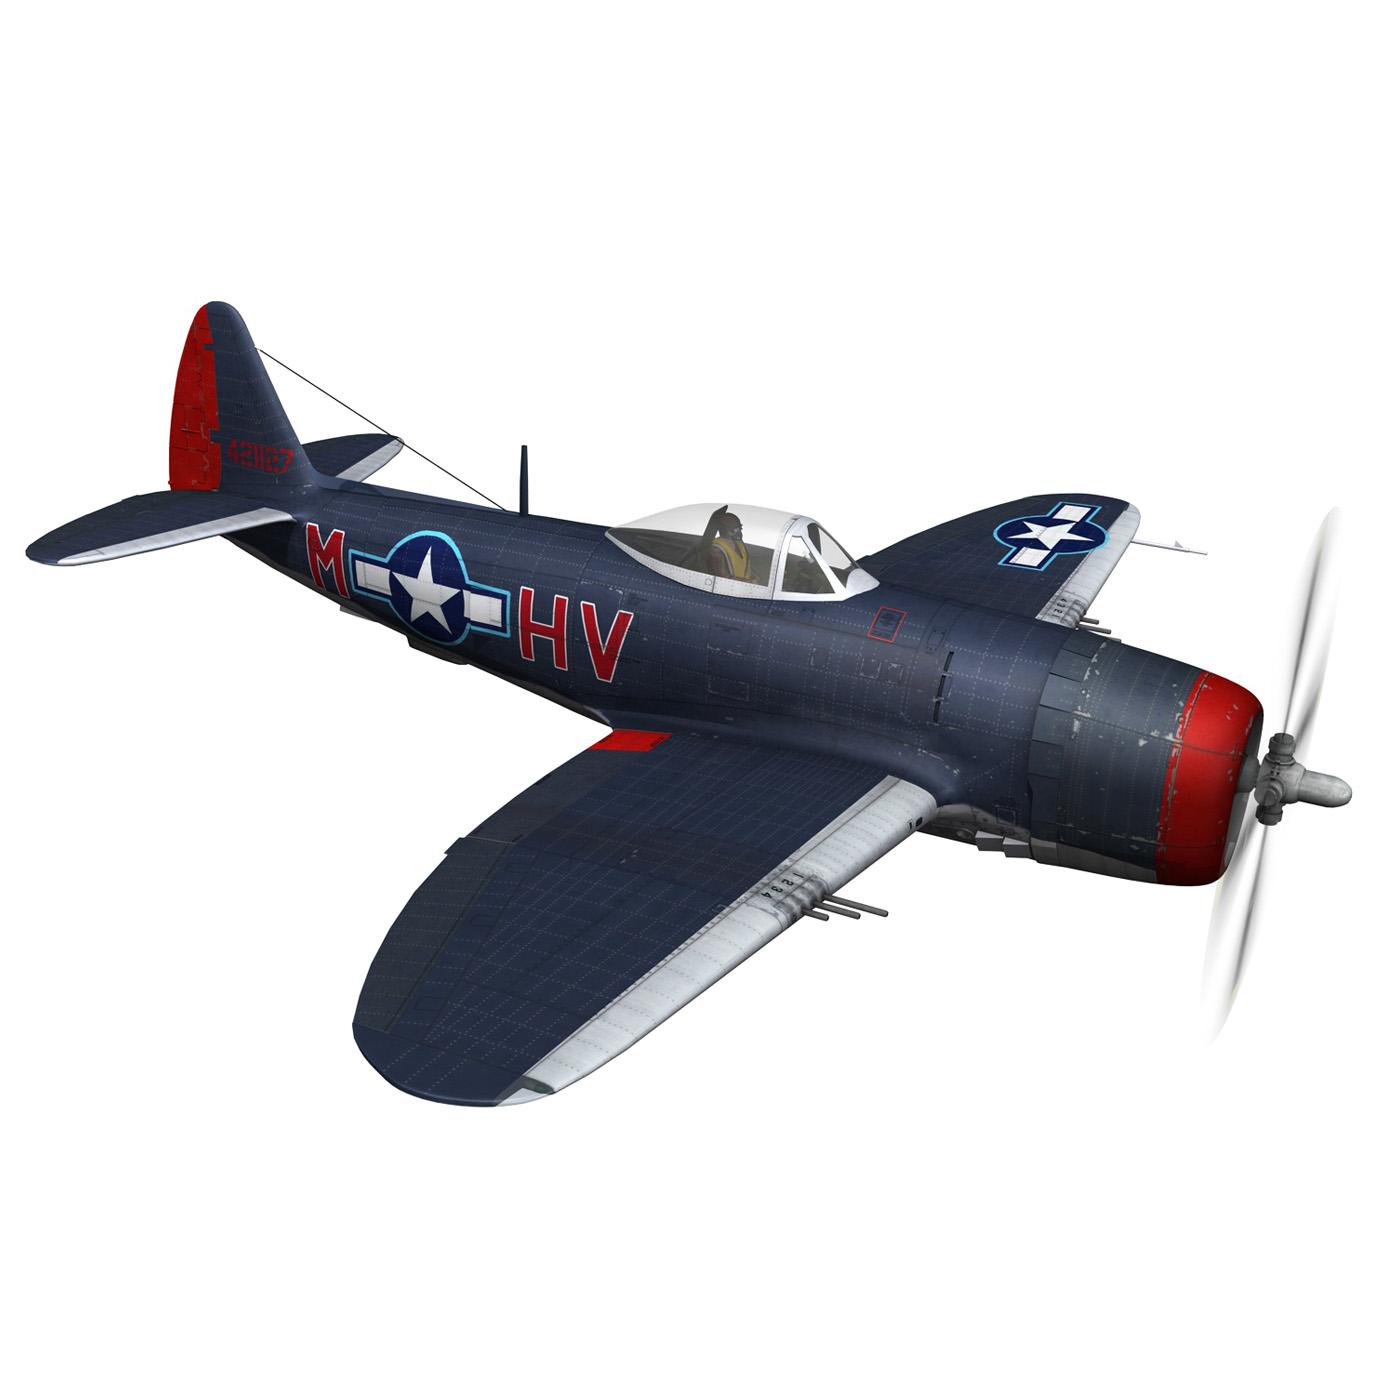 republic p-47m thunderbolt – pengie v 3d model 3ds c4d fbx lwo lw lws obj 279722